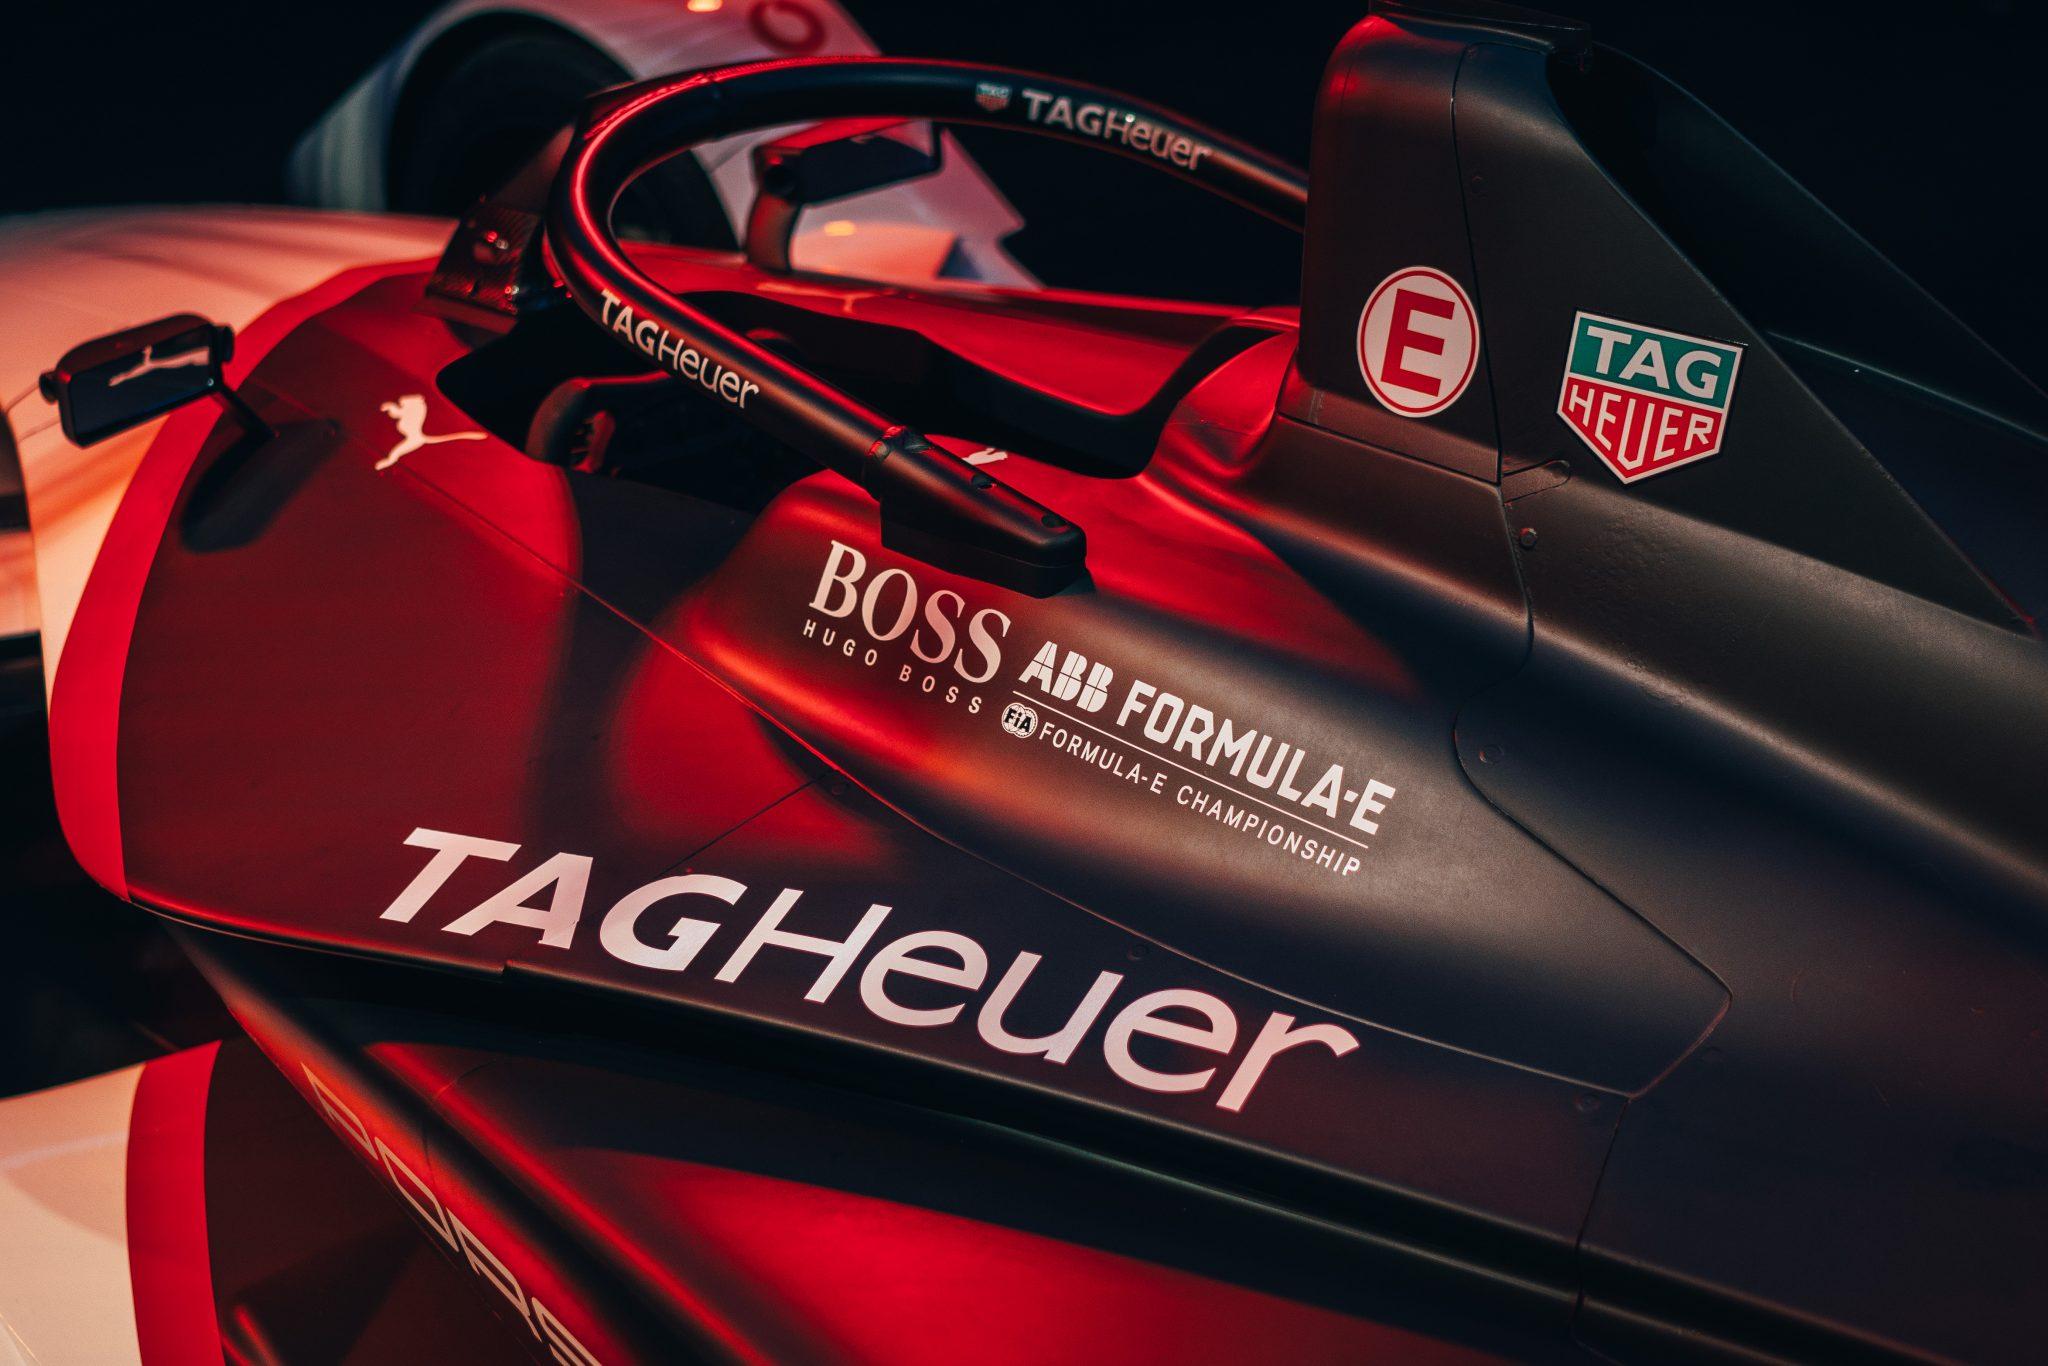 Premier a TAG Heuer Porsche Formula E csapata számára